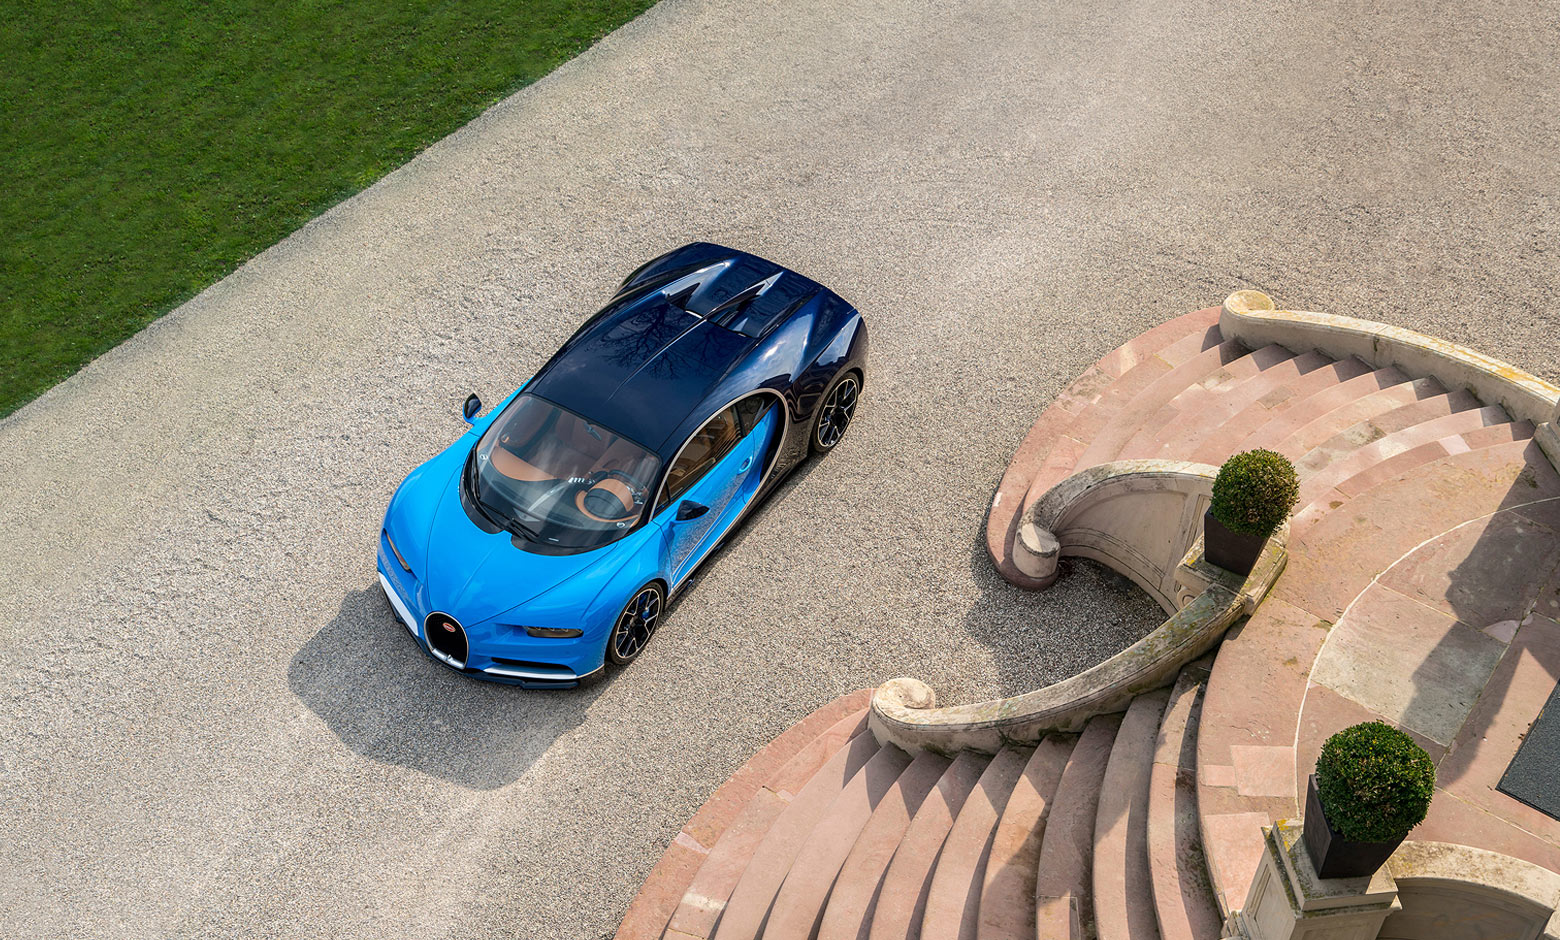 22B252812529 Άκου τα 1500 άλογα και θαύμασε την Bugatti Chiron Bugatti, Bugatti Chiron, Car sound, hypercar, supercars, top speed, videos